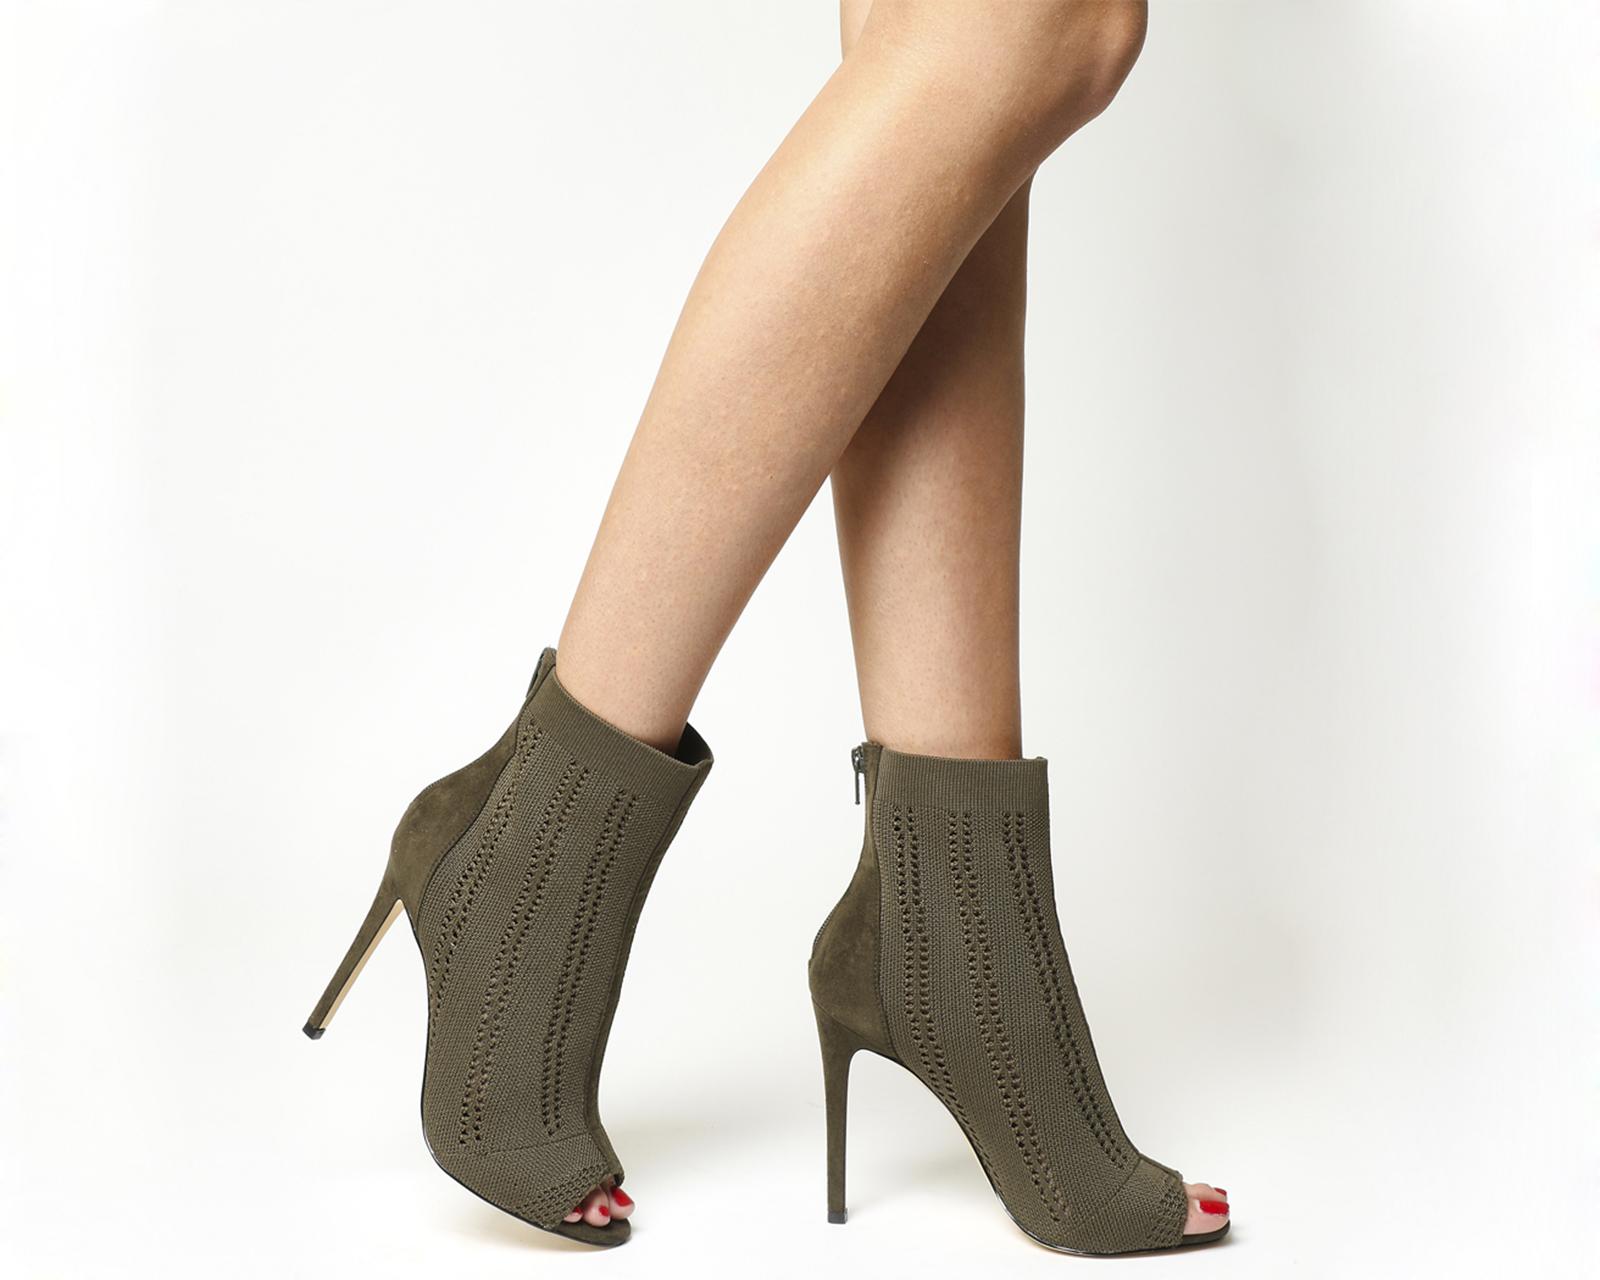 Sentinel Womens Office Lipstick Peep Toe Ankle Boots Khaki Knit Boots 9098224e5f42